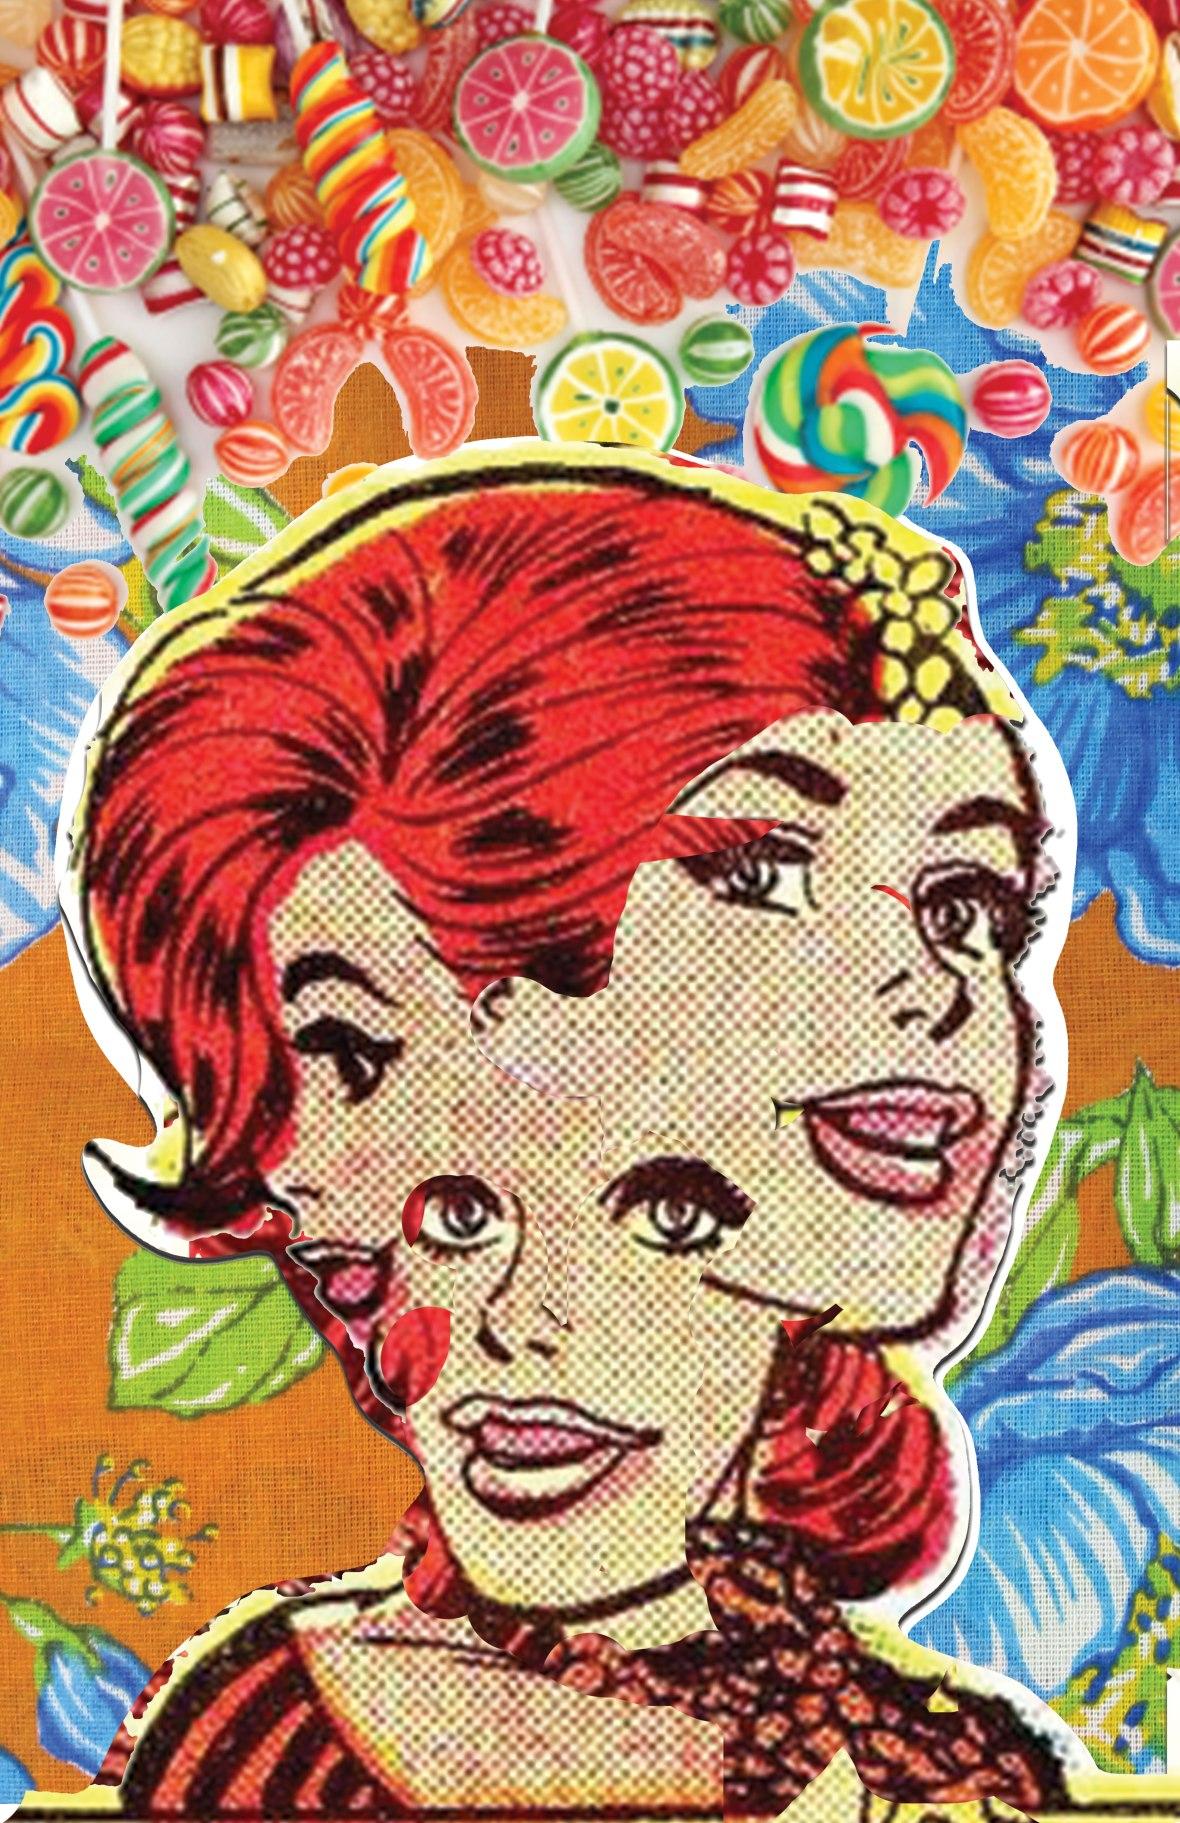 Princess-Doces-de-frutas2